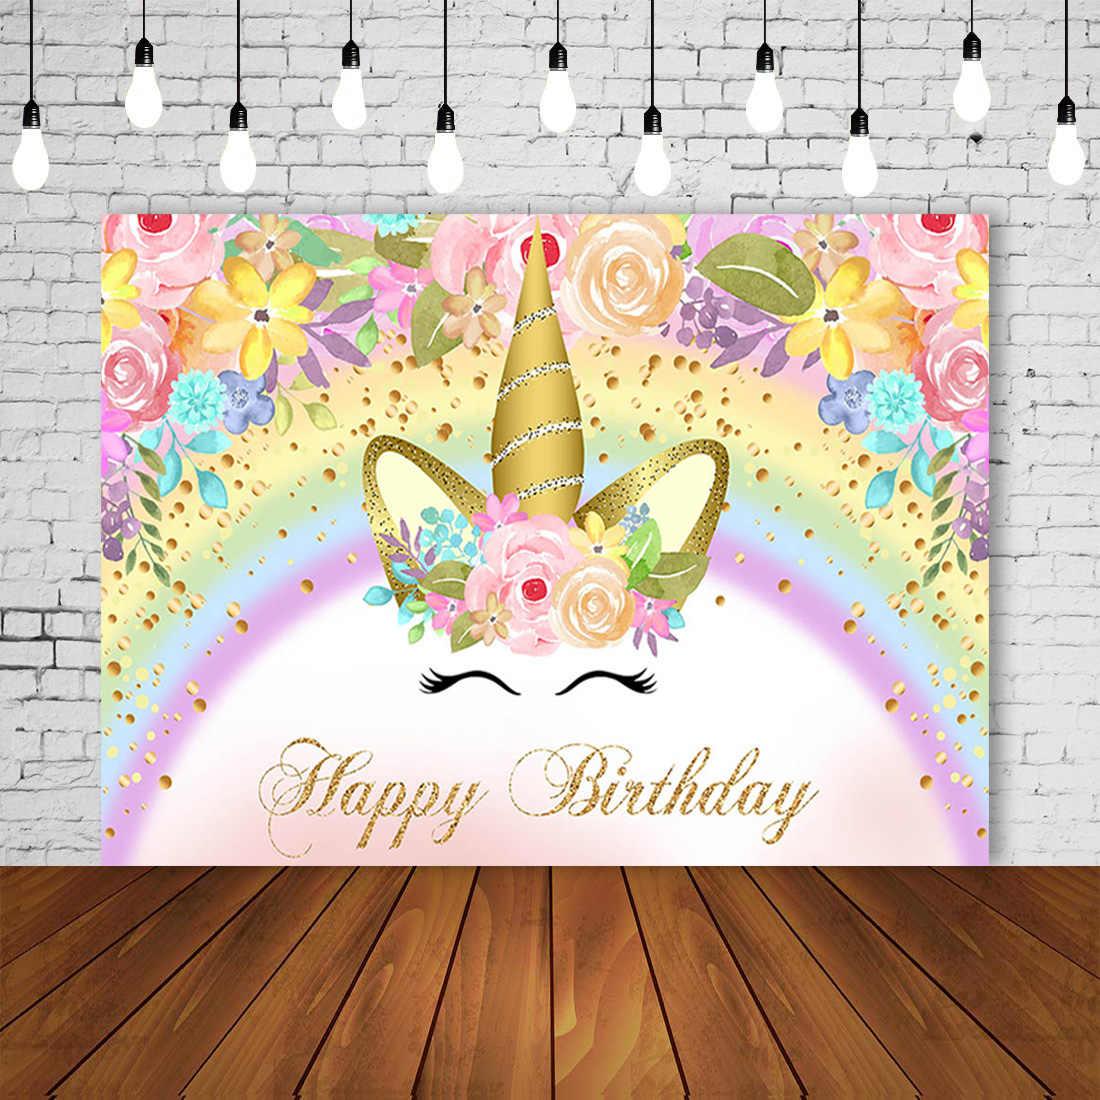 Video Studio Backdrop Unicorn Little Princess Happy Birthday Rainbow Watercolor Flowers Seamless Photography Photo Cartoon Props Background Fabric Golden Crown Vinyl Props Backdrop